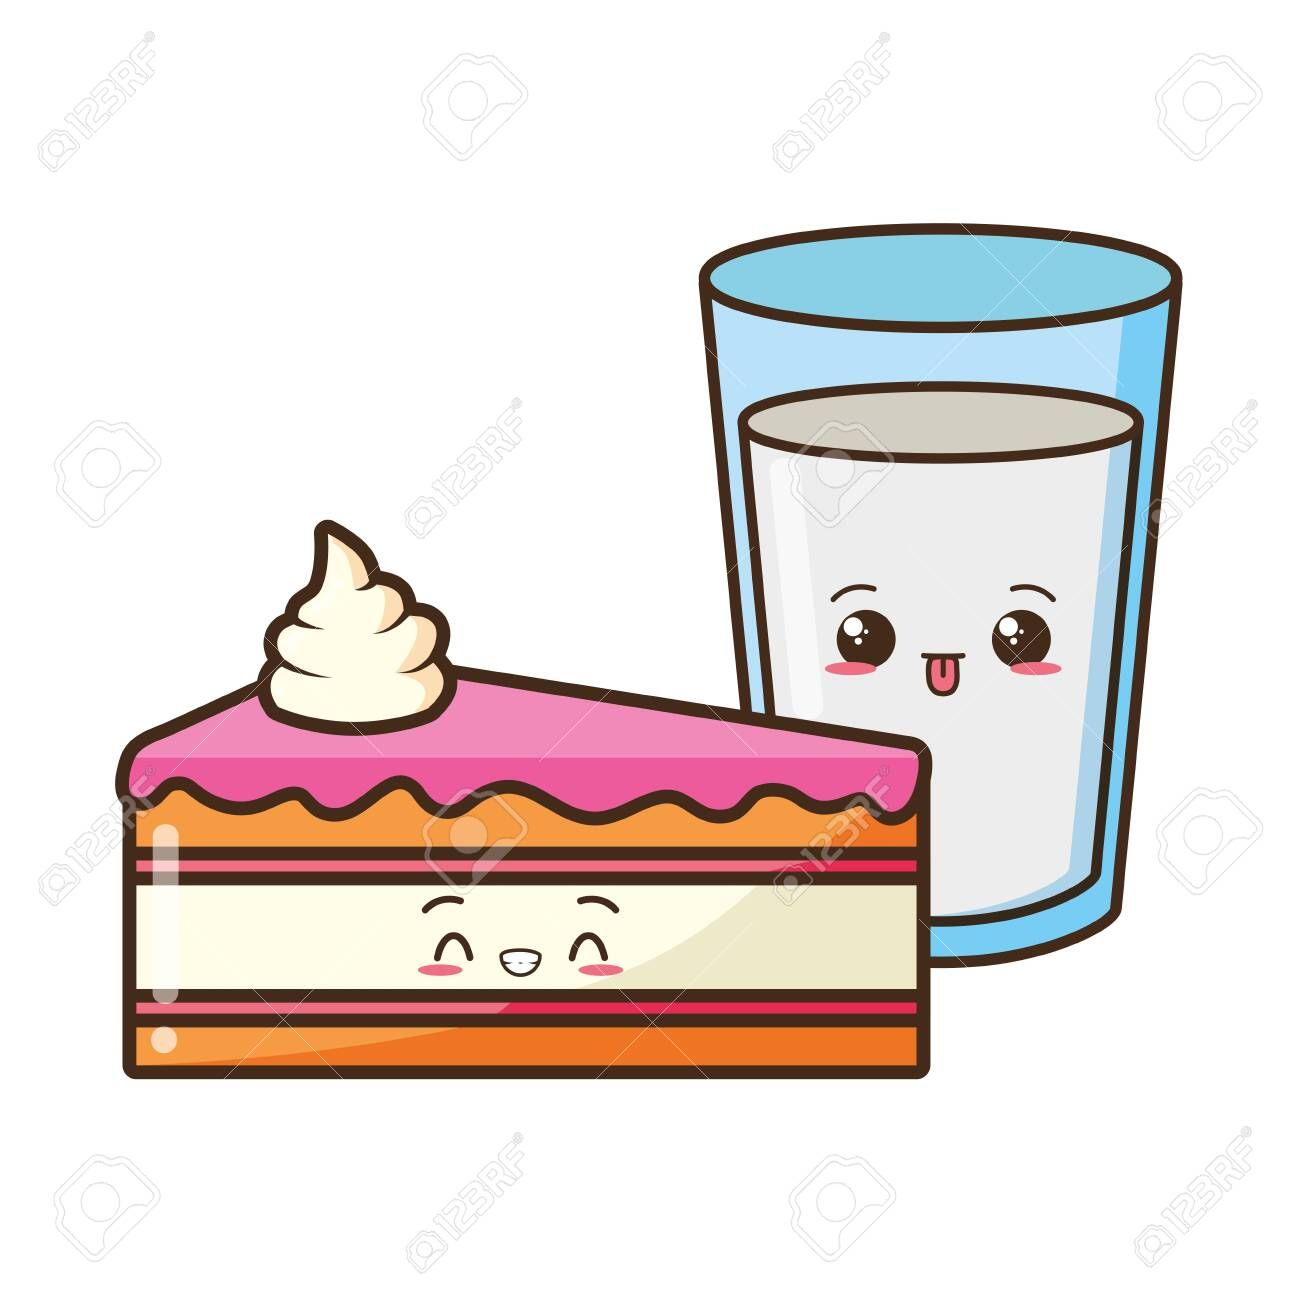 kawaii cake and milk food cartoon vector illustration ,